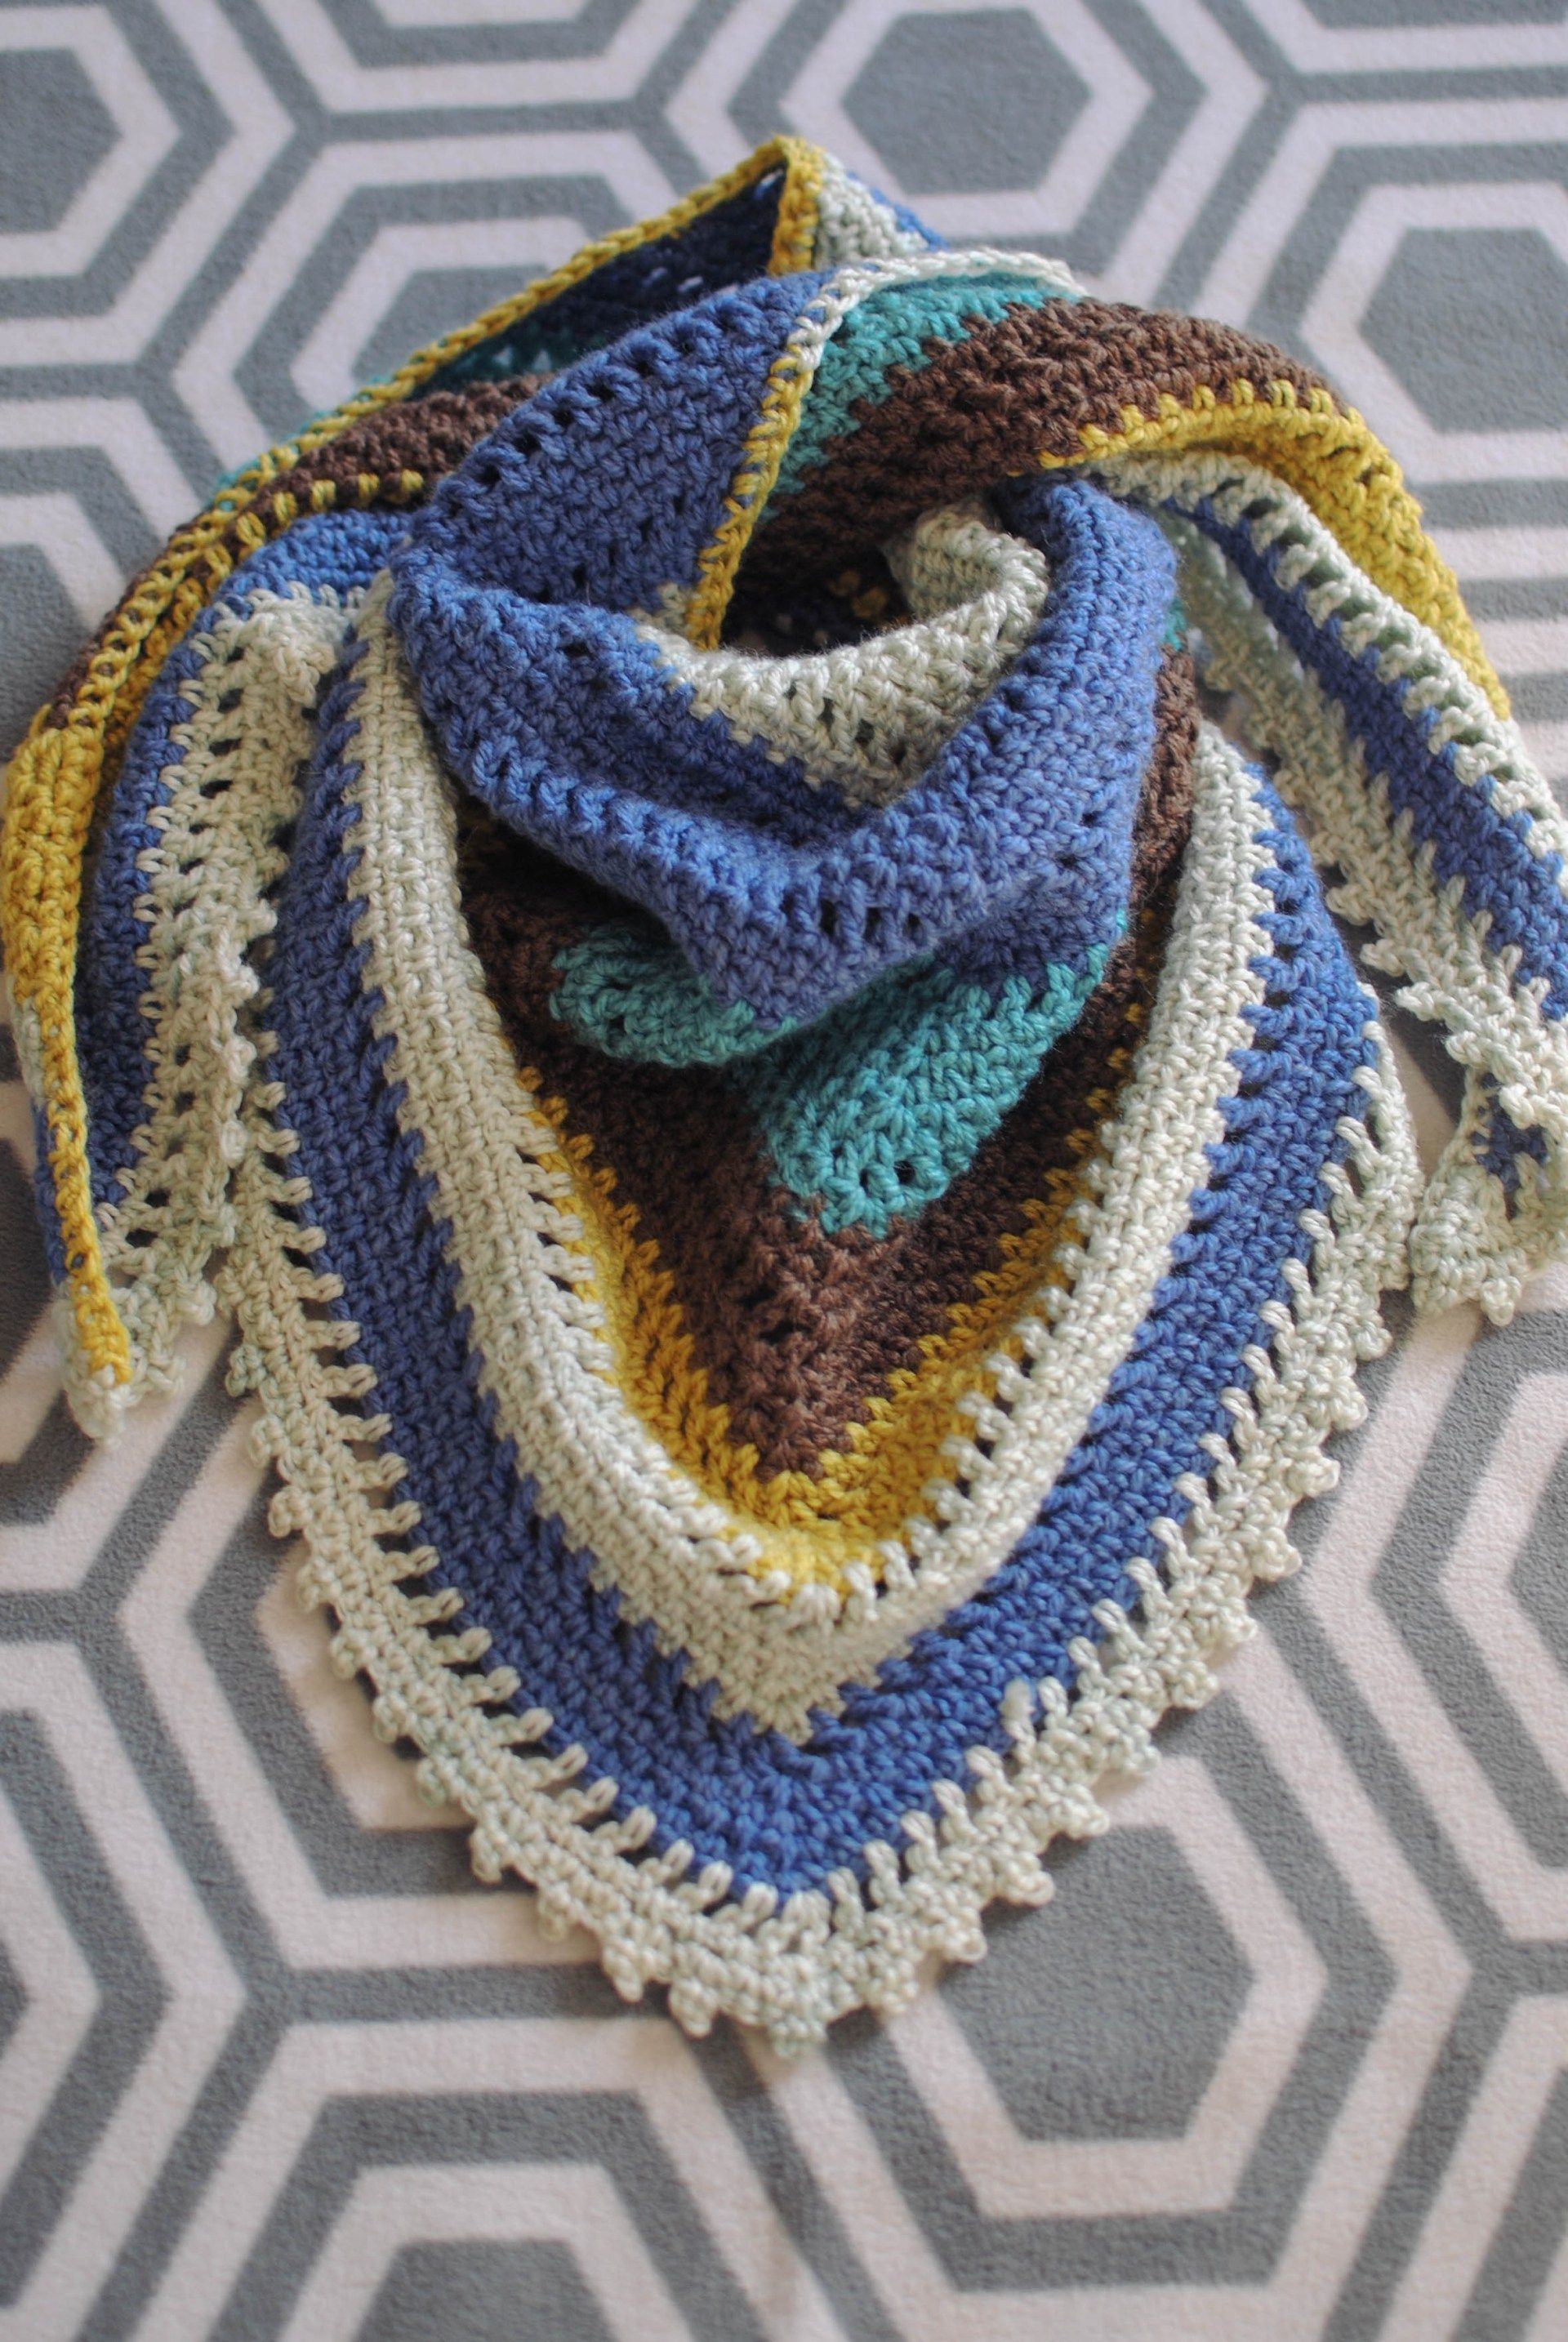 caron cotton cakes knitting patterns